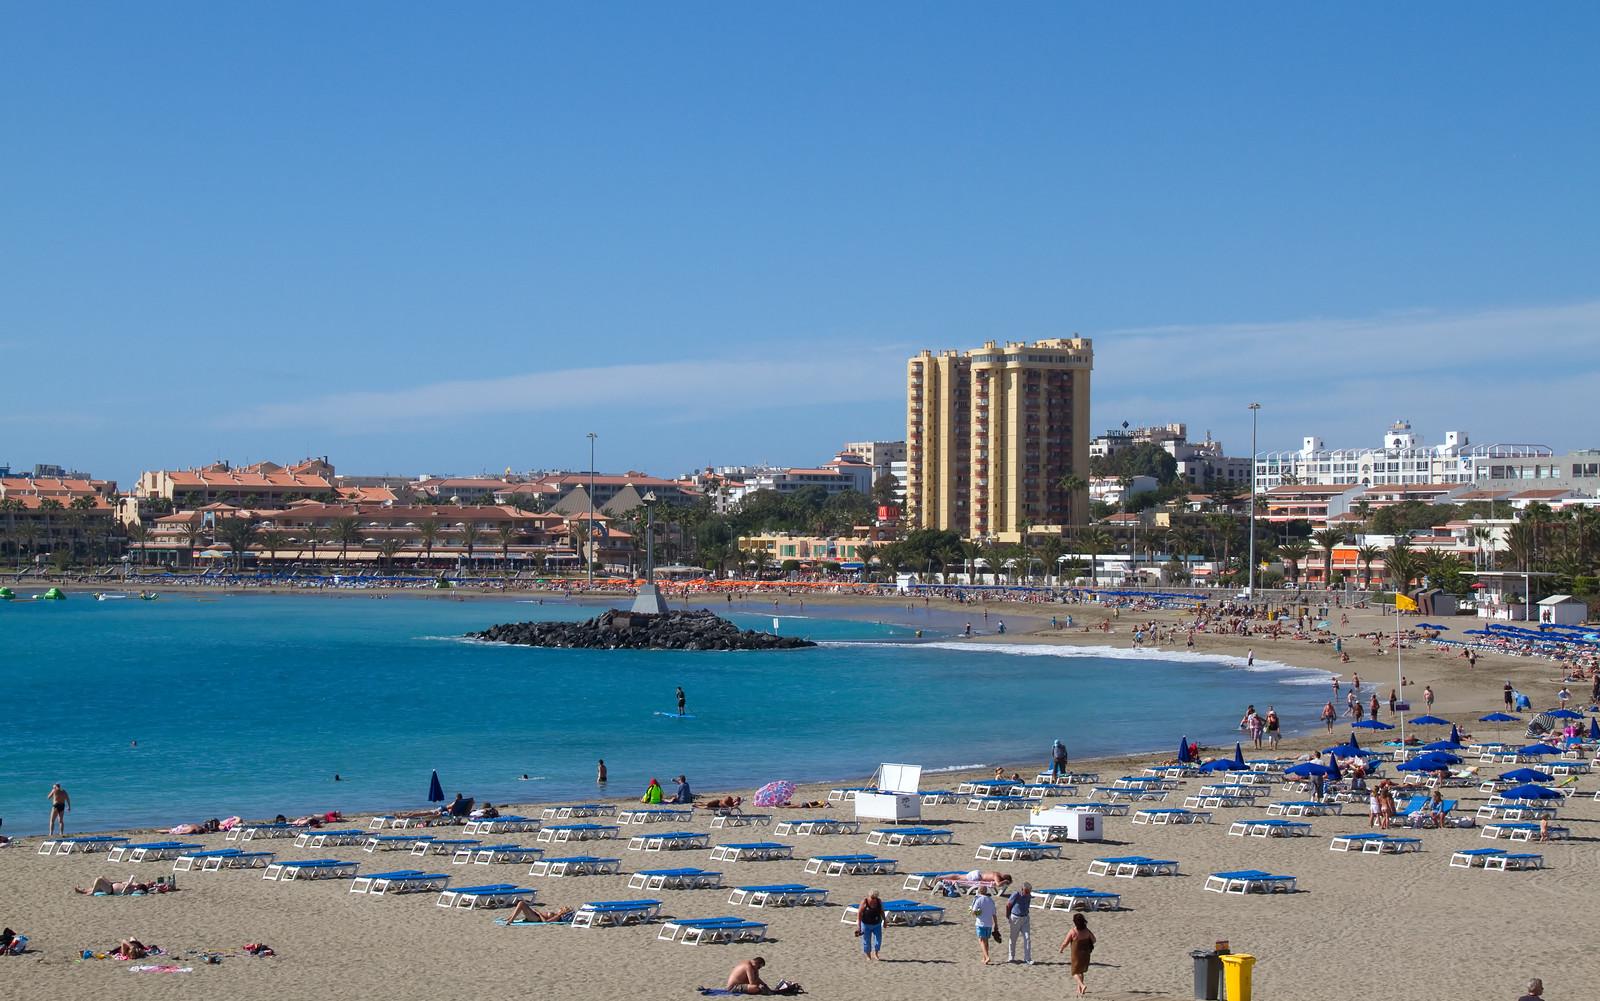 Tenerife Los Cristianos 2